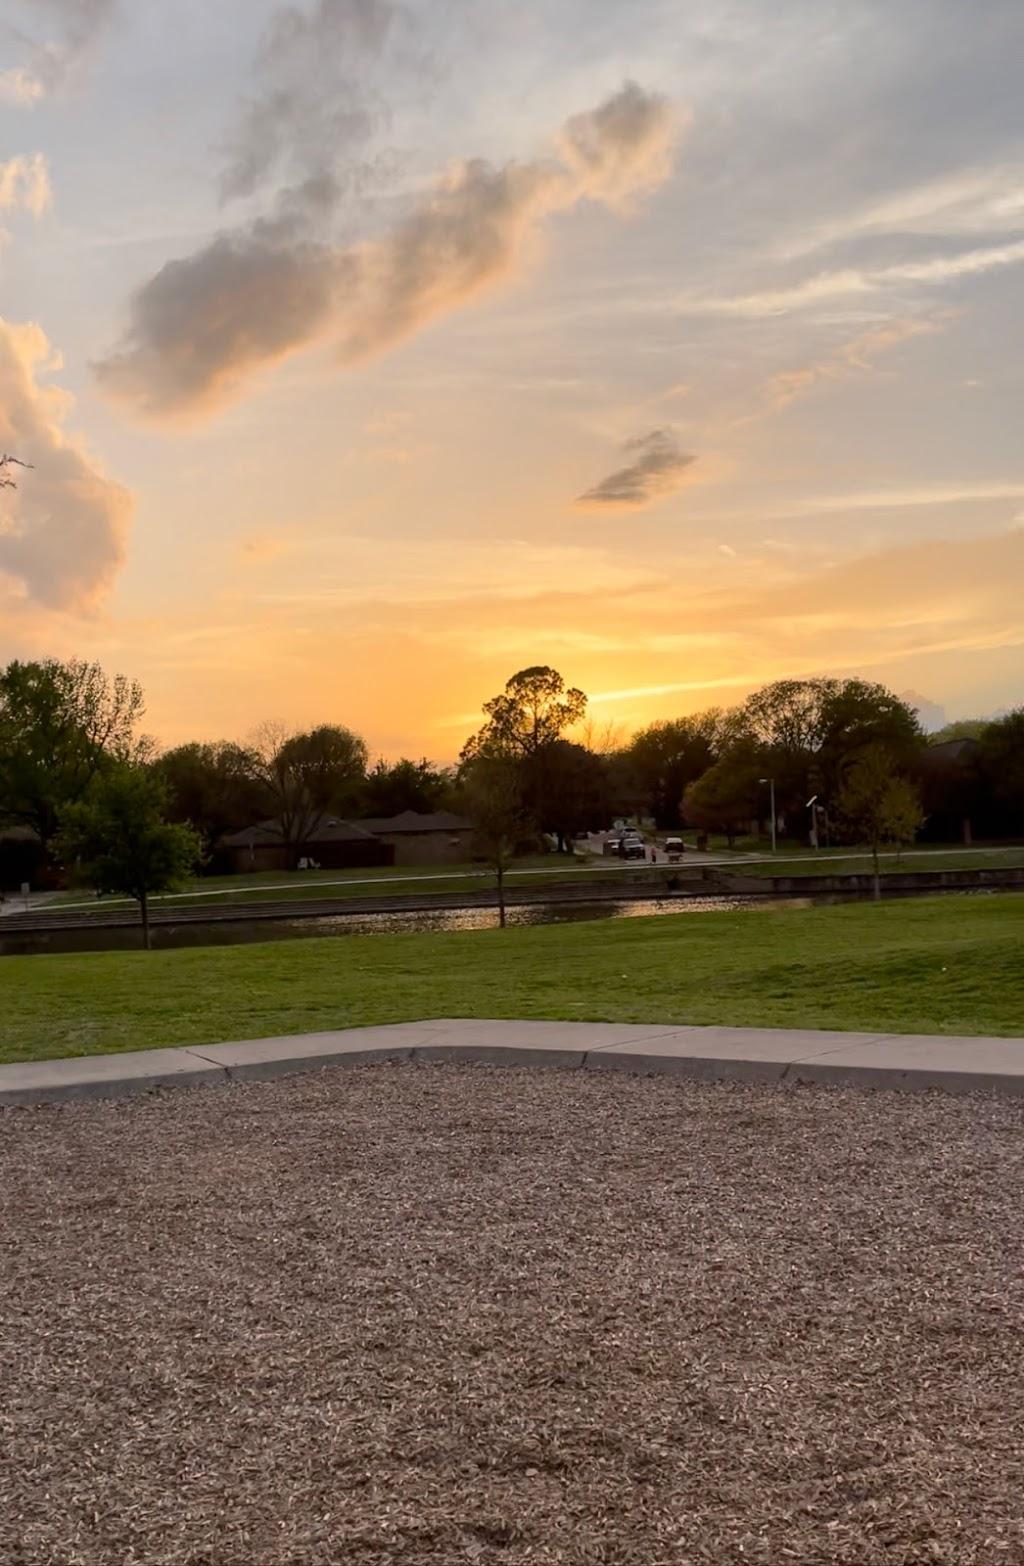 Big Lake Park - park  | Photo 4 of 10 | Address: 3800 Rainier Rd, Plano, TX 75023, USA | Phone: (972) 941-7250